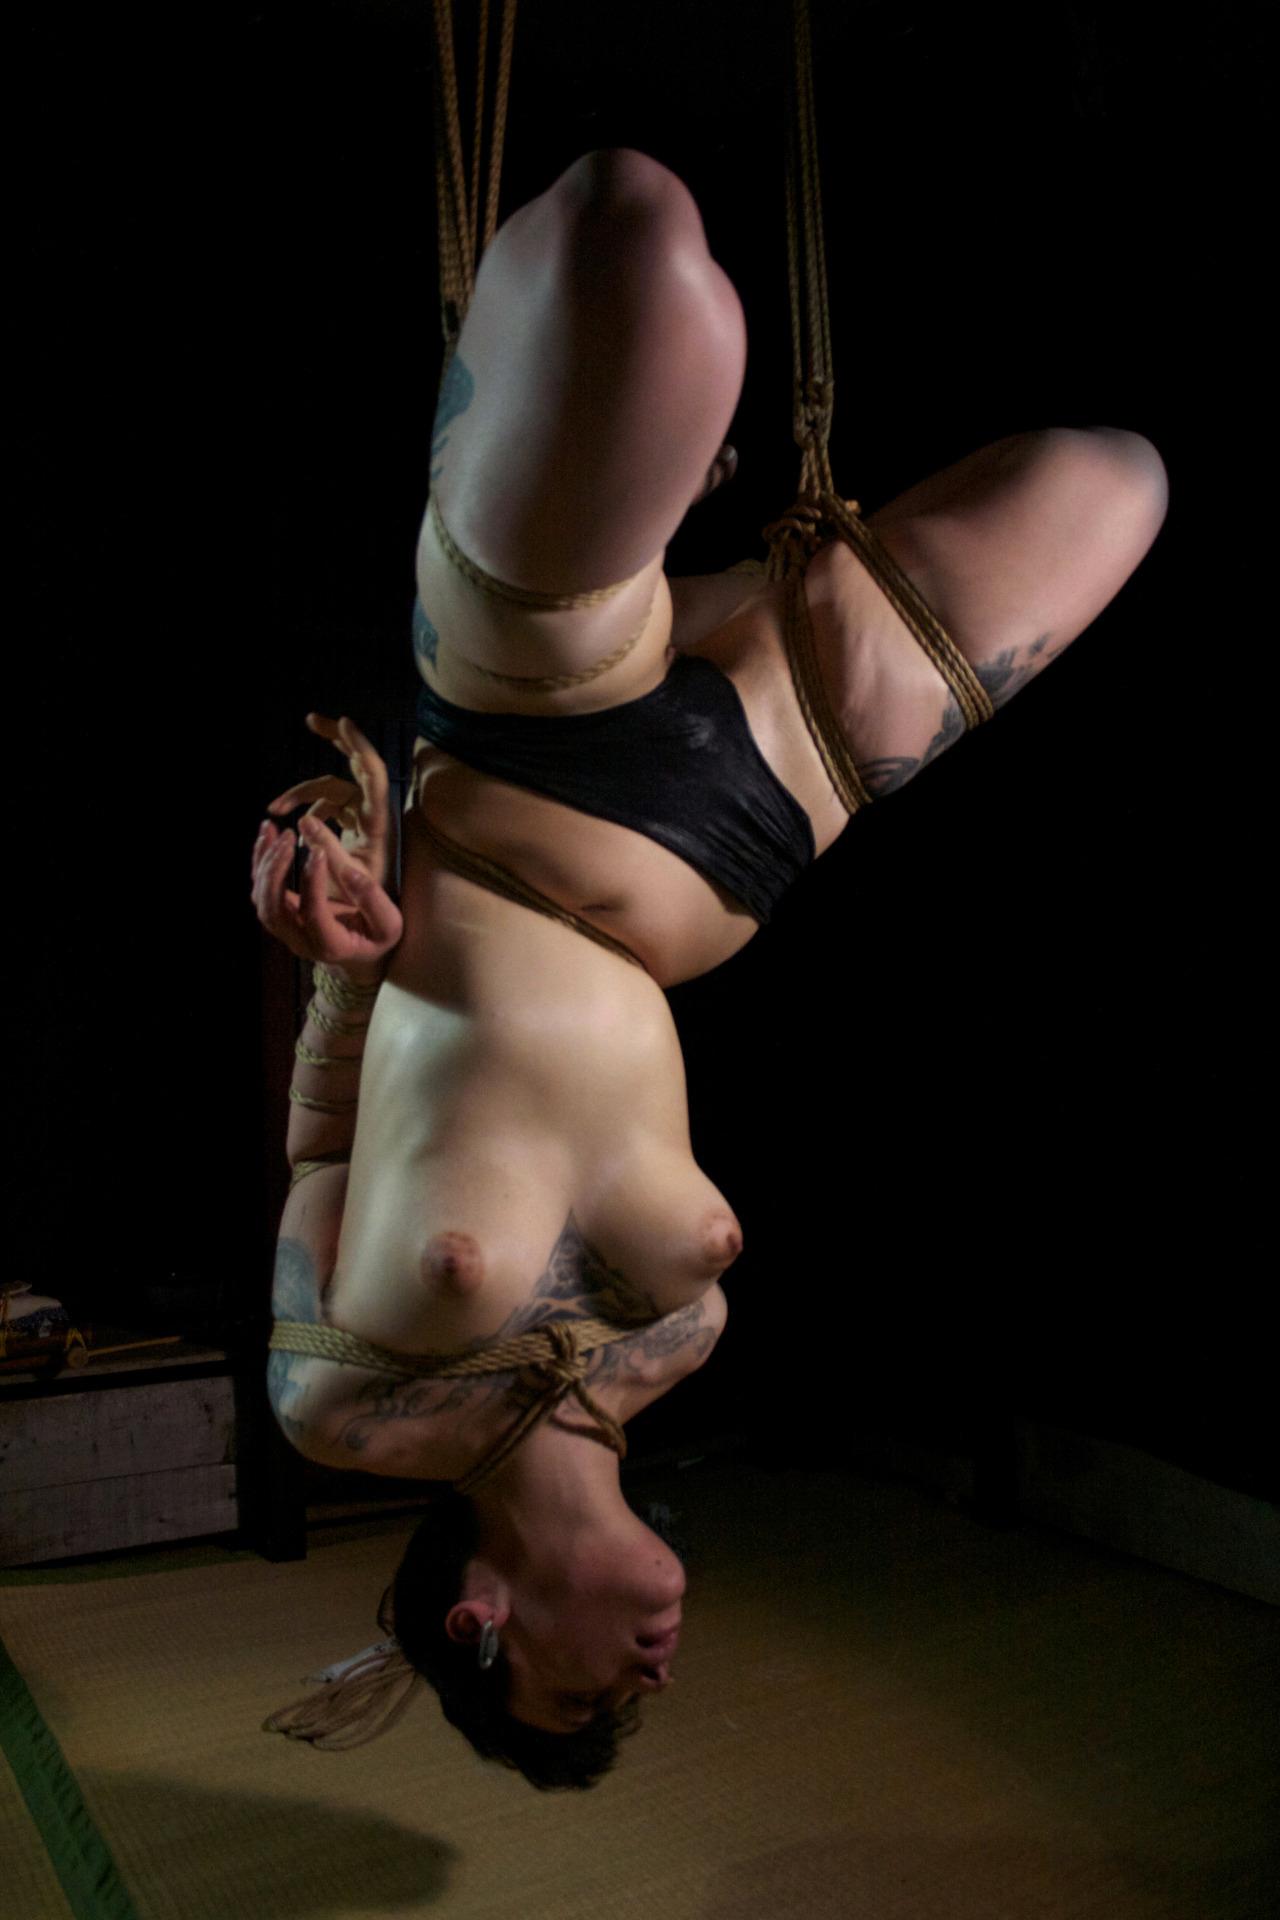 【SMエロ画像】バランス保った上でのプレイw真似しちゃいけない宙吊り緊縛M女www 02